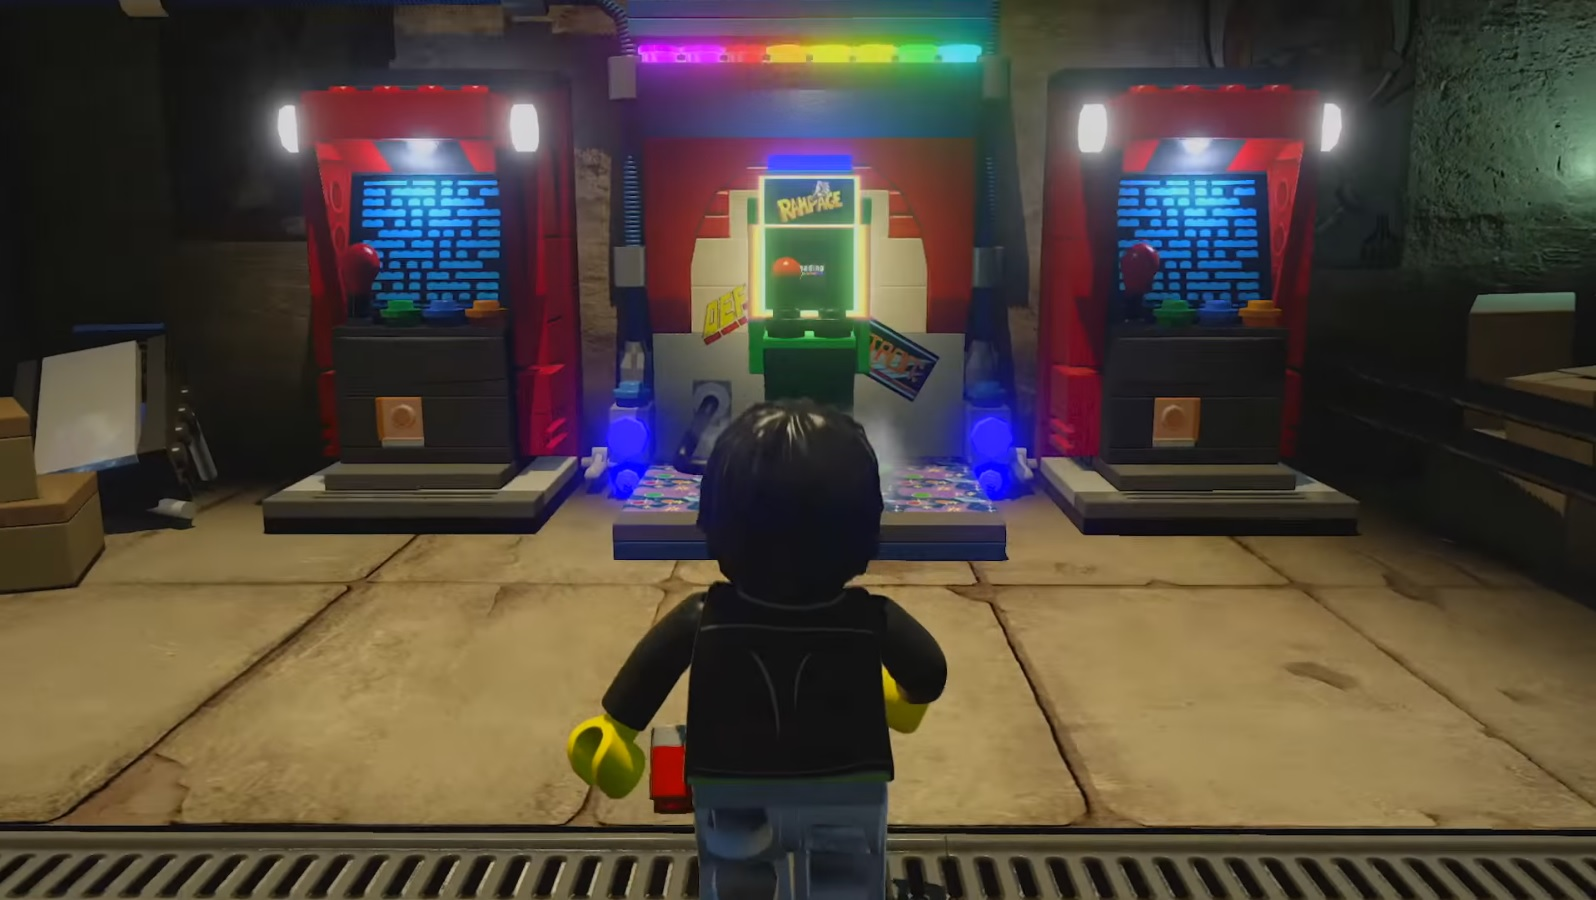 lego dimensions midway arcade gameplay trailer nintendo. Black Bedroom Furniture Sets. Home Design Ideas